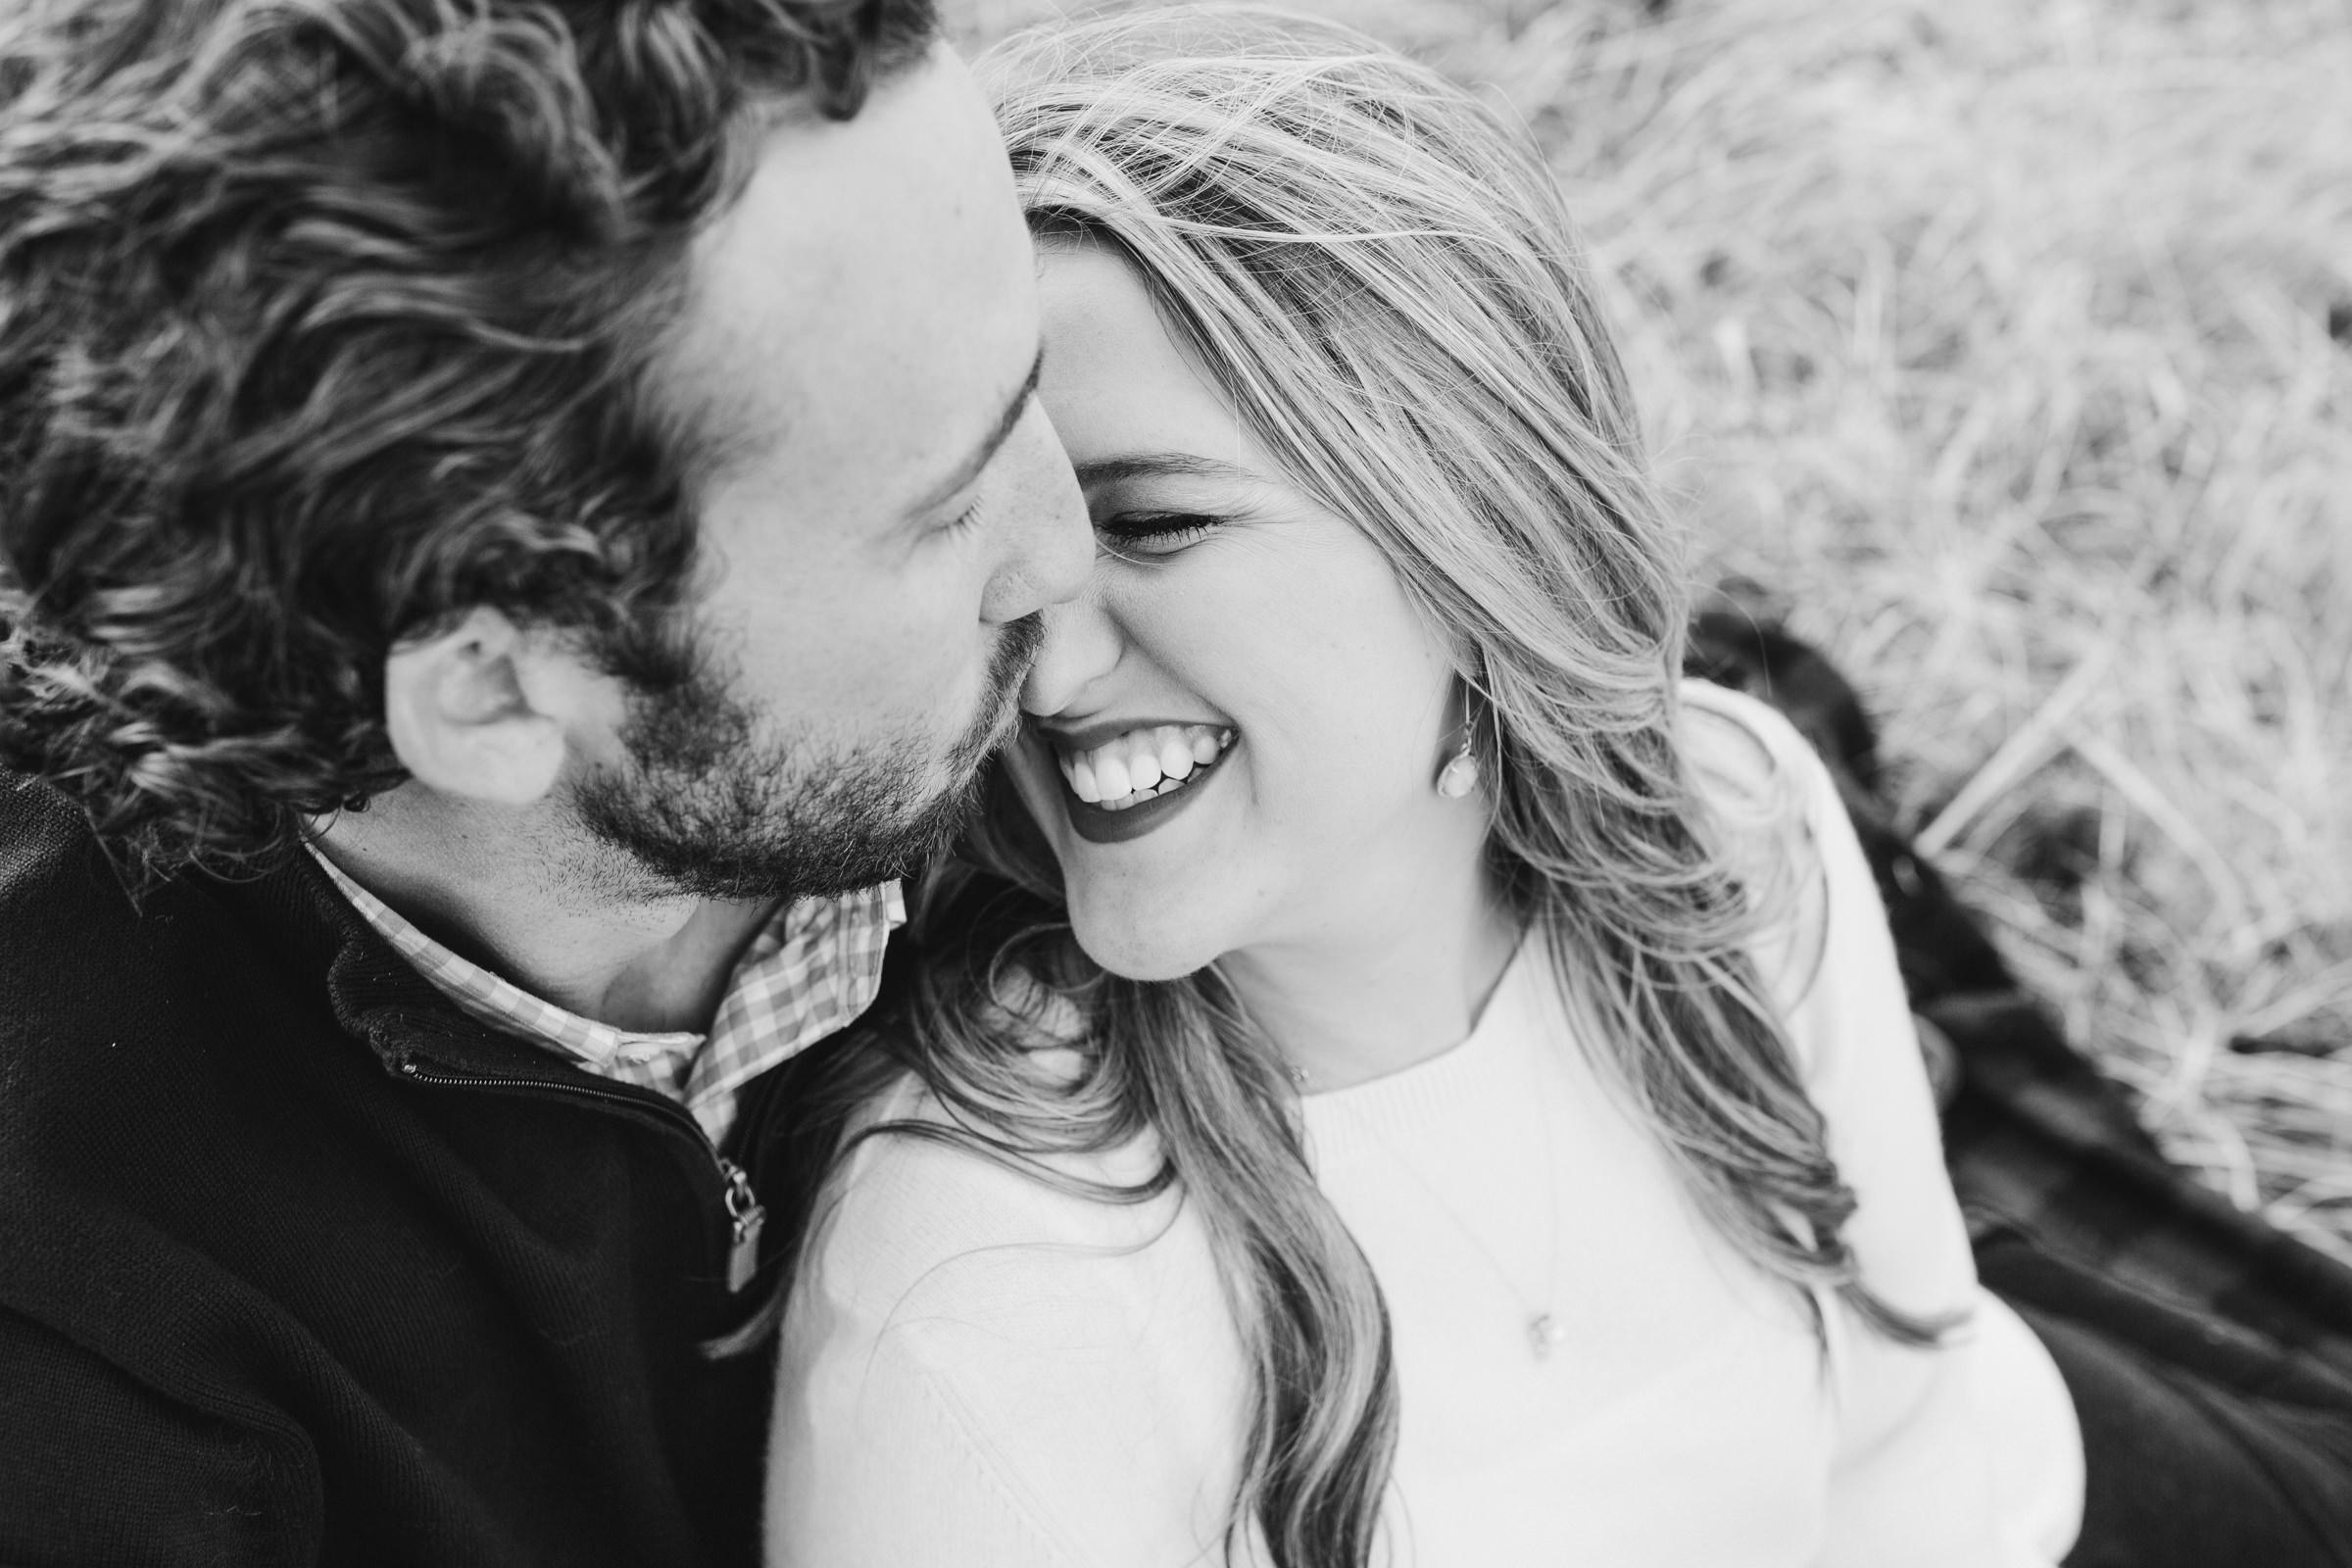 couples-photographer-okc.JPG